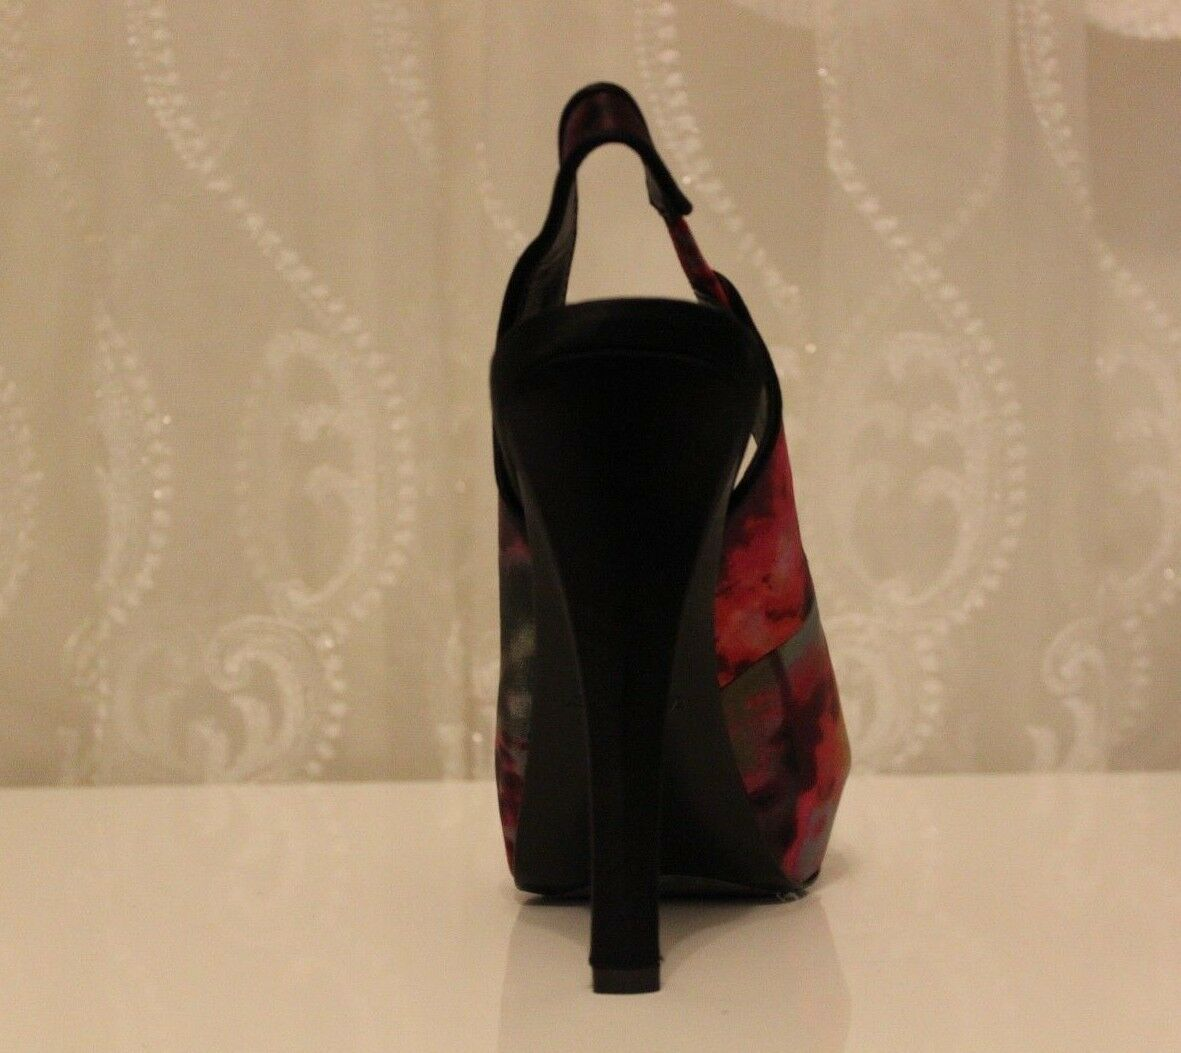 Karen Millen FN064 Tropical Smudge Print 5 Strappy Purple Shoe UK 5 Print  38 ae4138